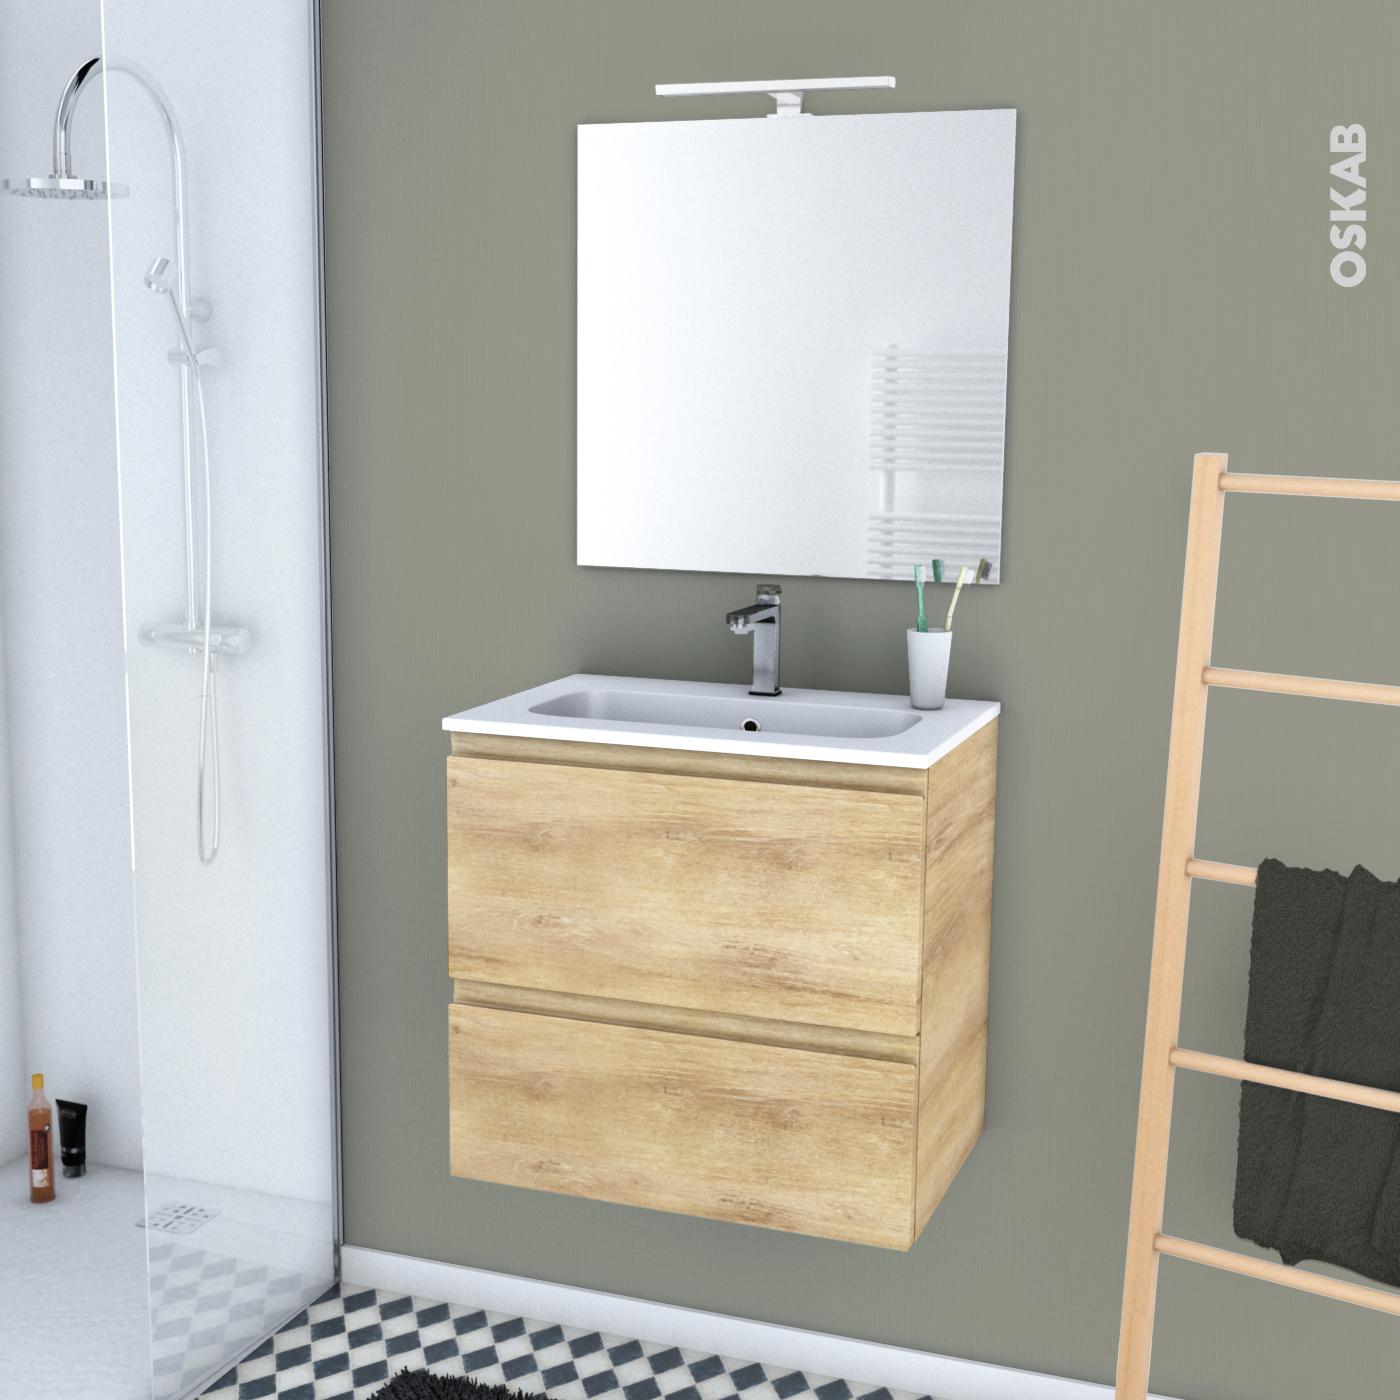 meuble vasque salle de bain 60 cm 46155 salle de bain id es ForMeuble Salle De Bain 60 Cm Bois